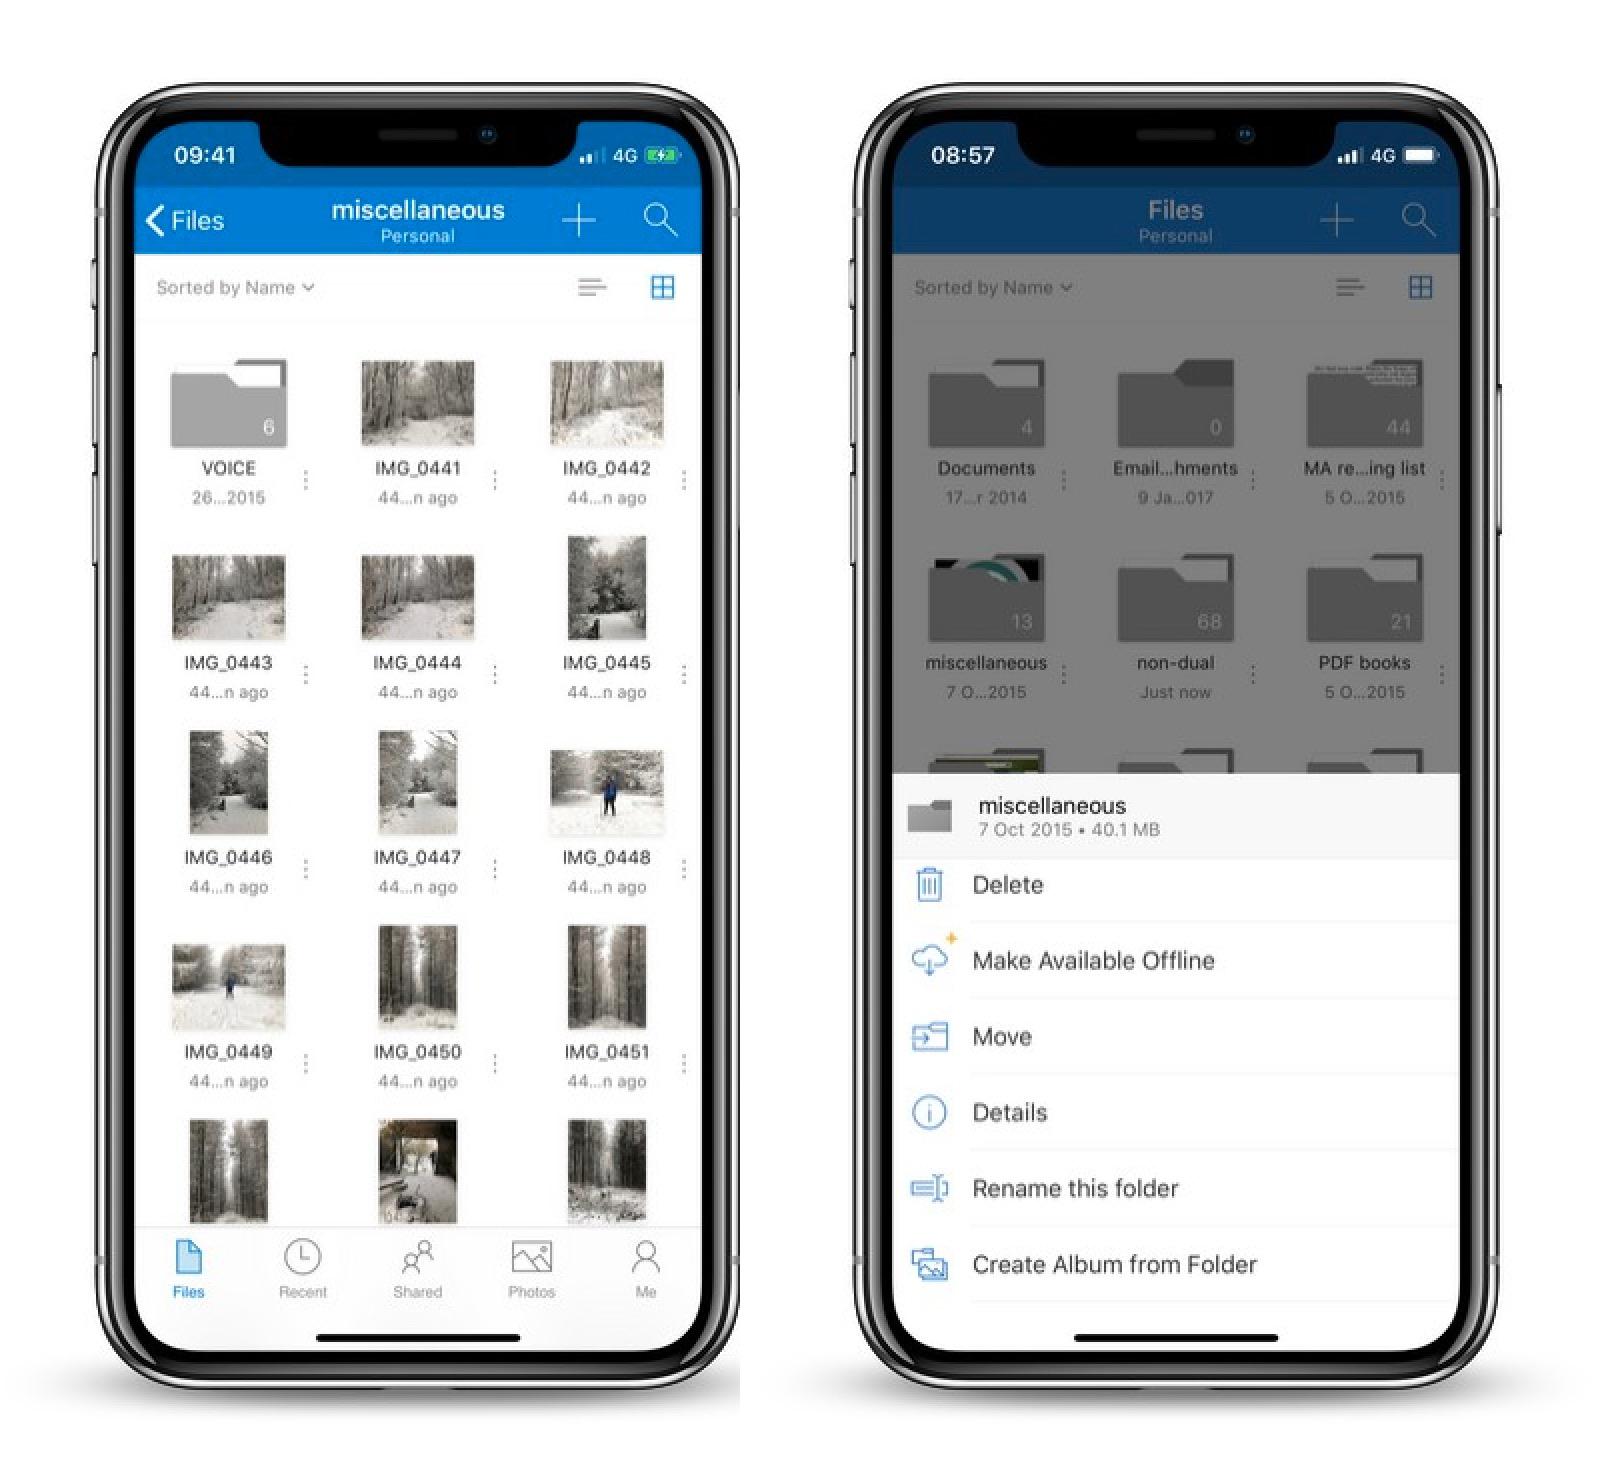 SkyDrive for iPhone and iPad full screenshot